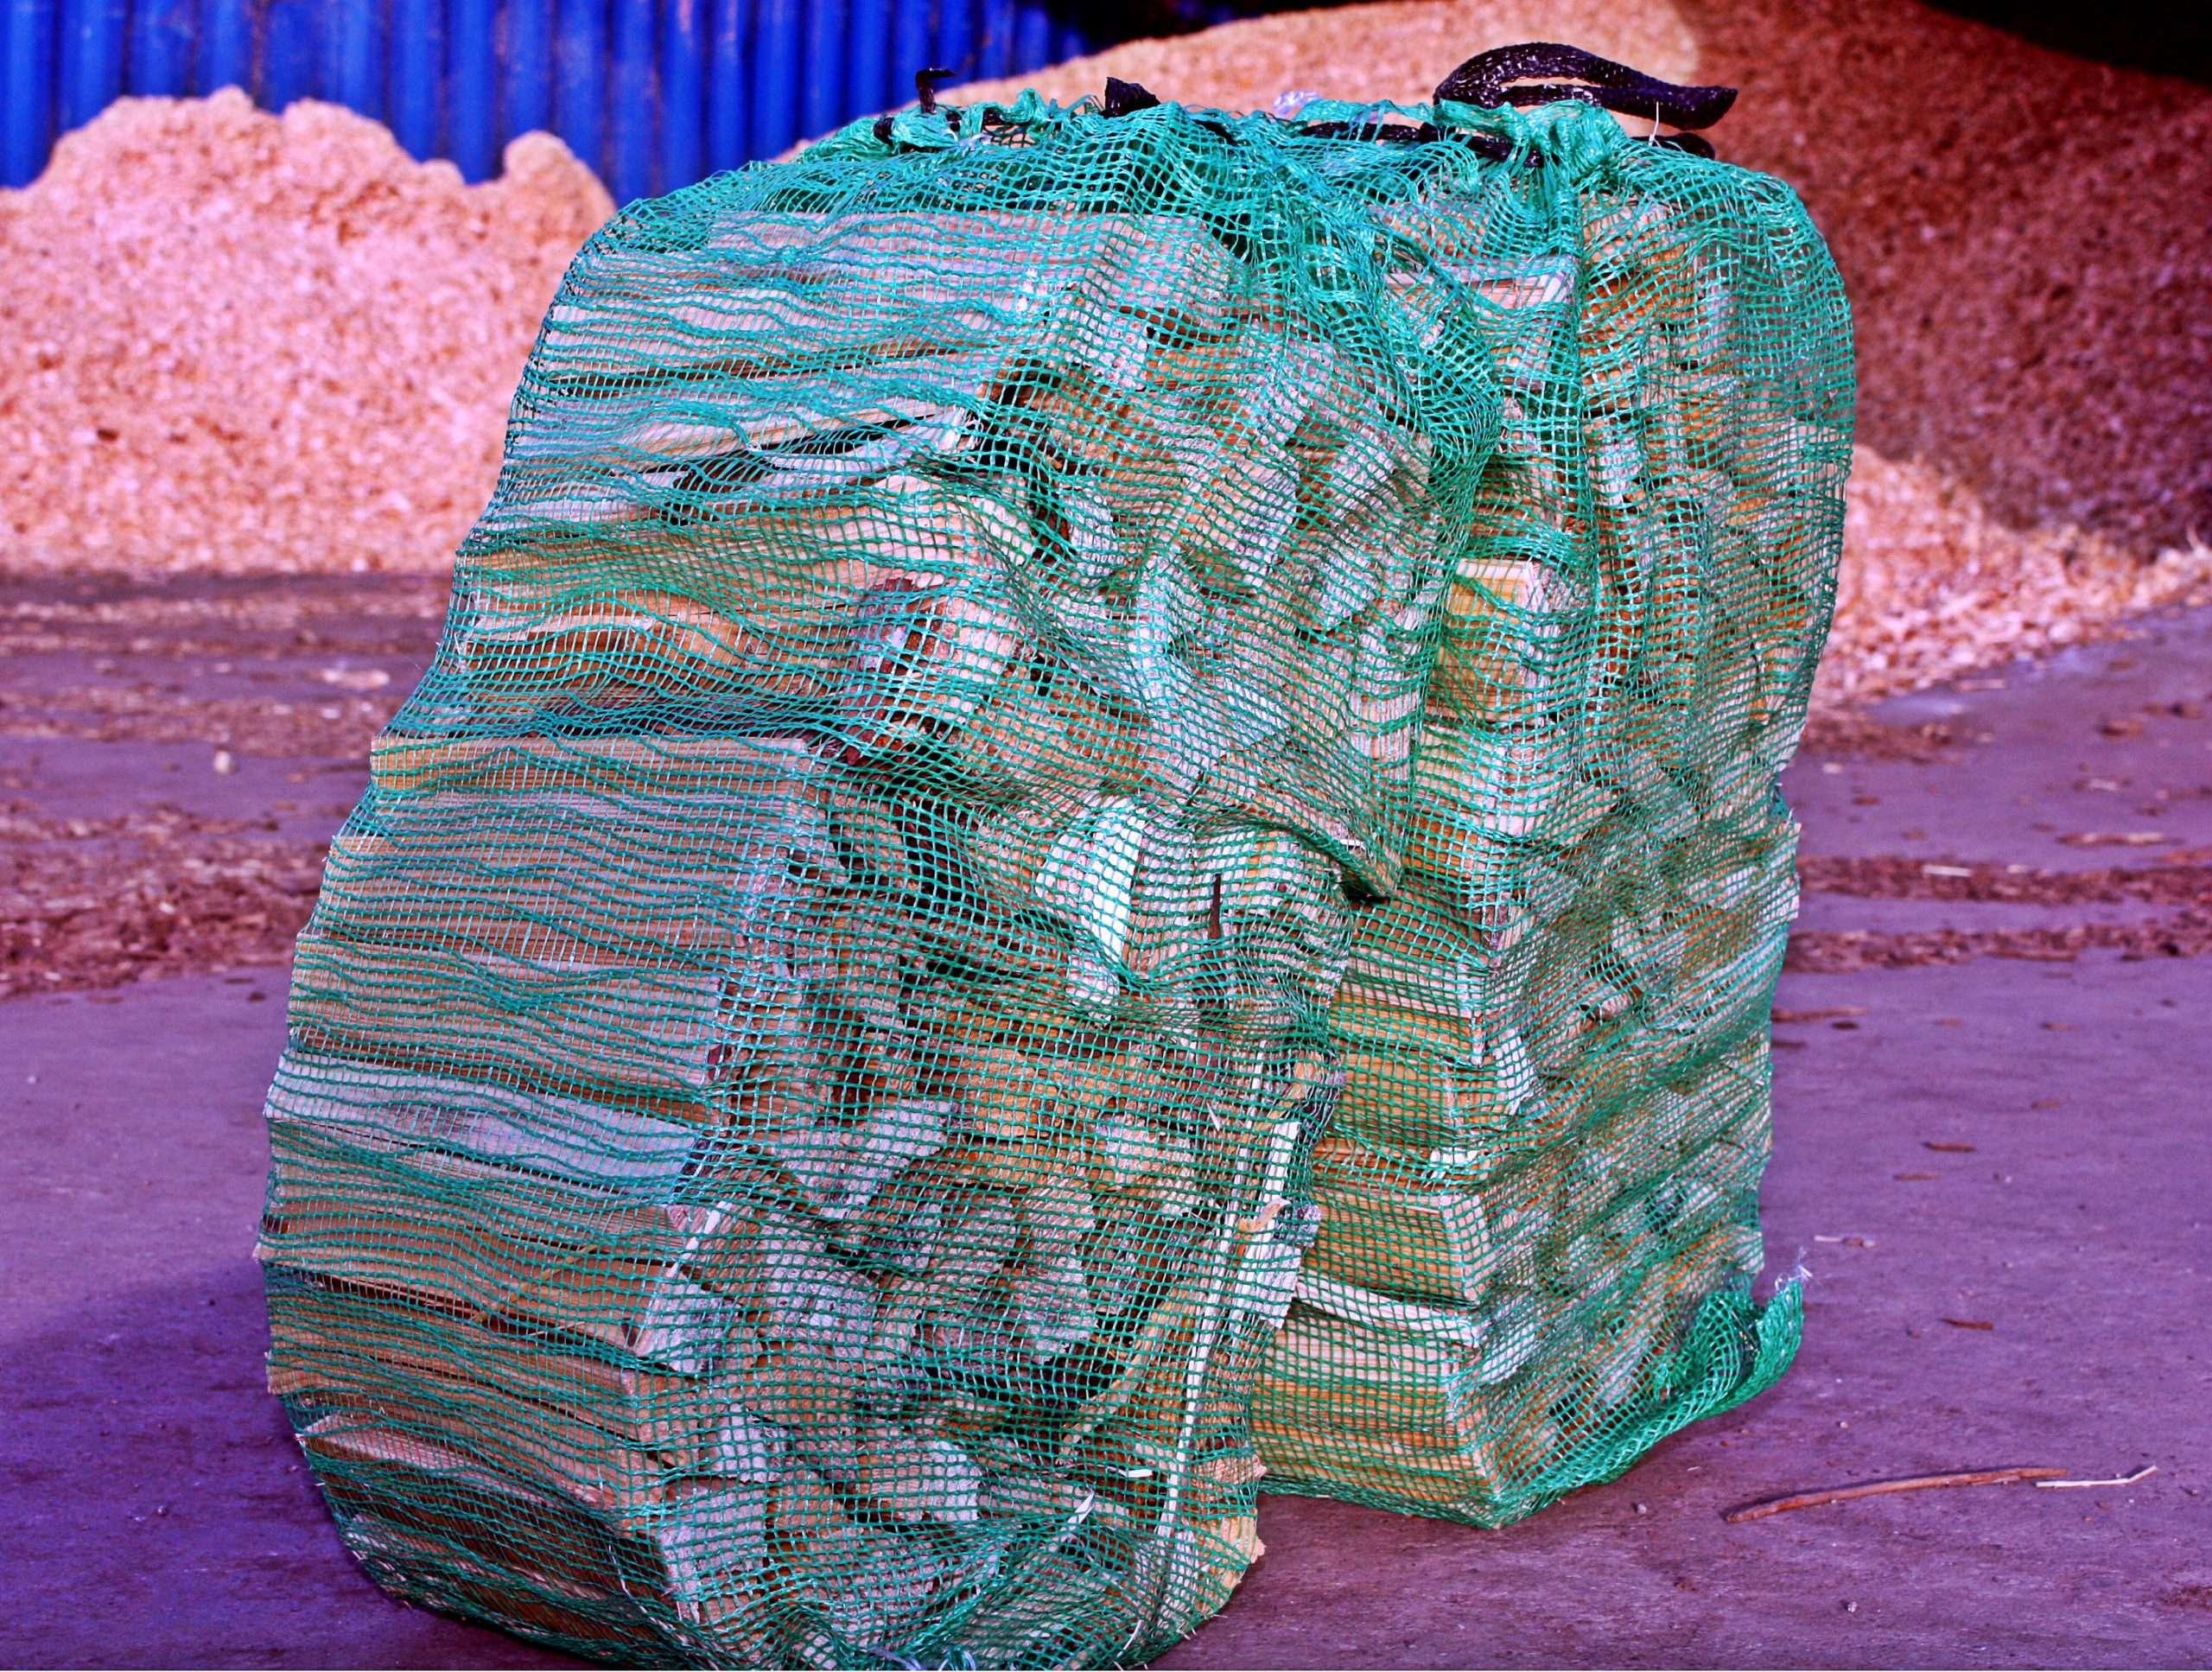 logs and biomass fuel Darlington